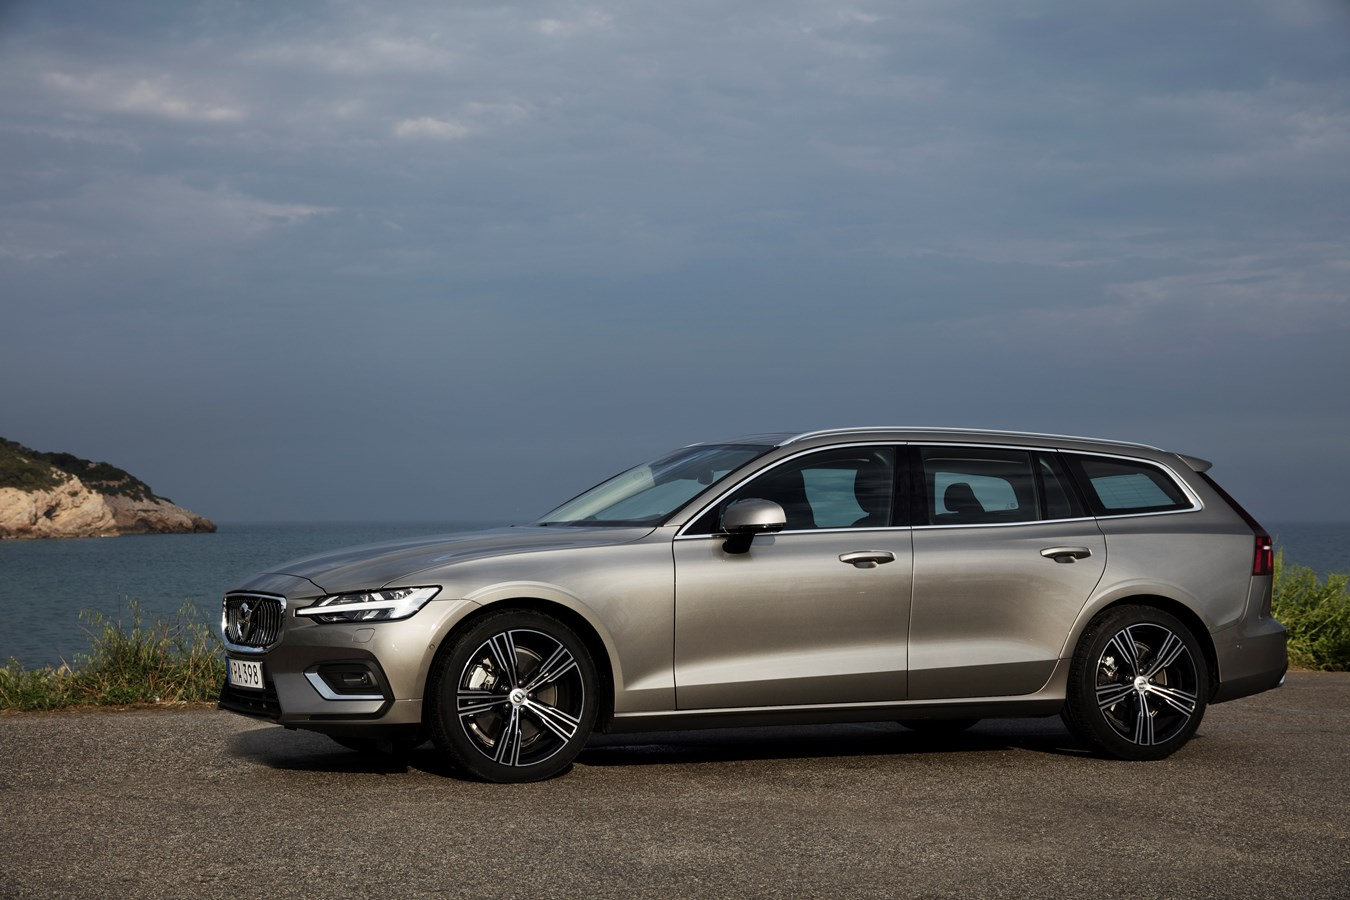 Volvo V60 Cross Country >> New V60 T6 Inscription Pebble Grey interior and exterior footage - Volvo Car UK Media Newsroom